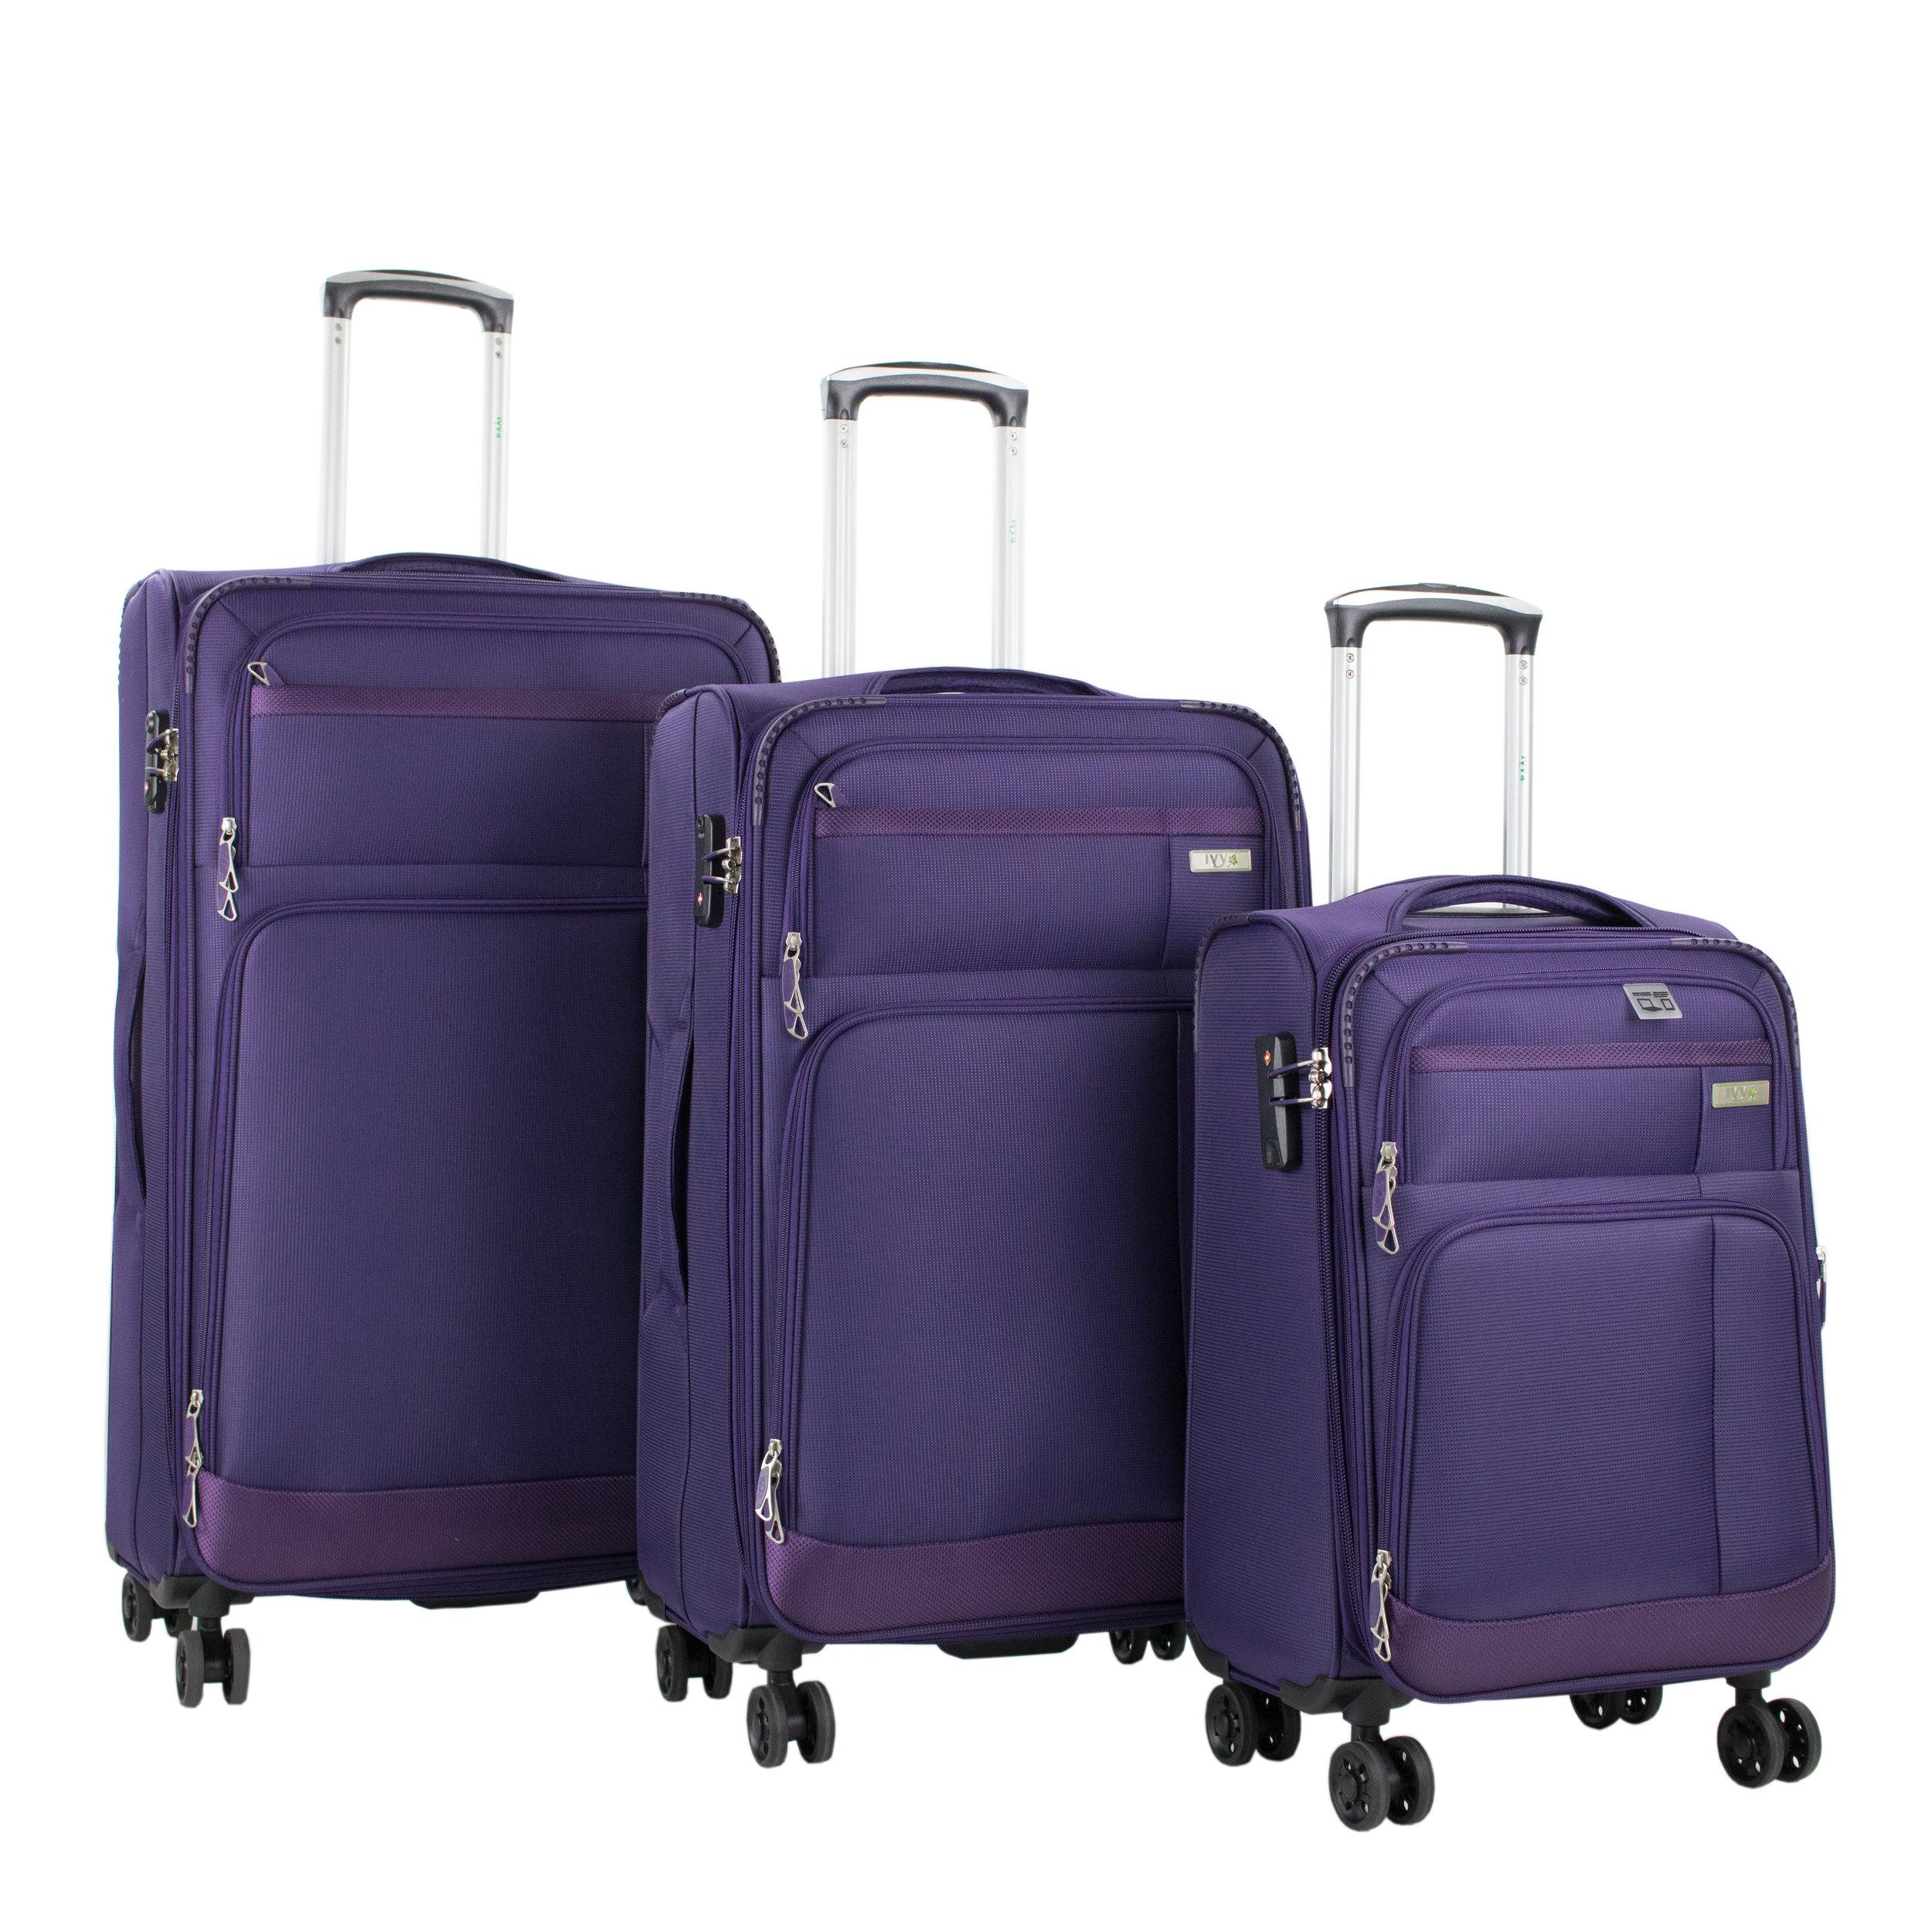 IVY015_Purple.jpg